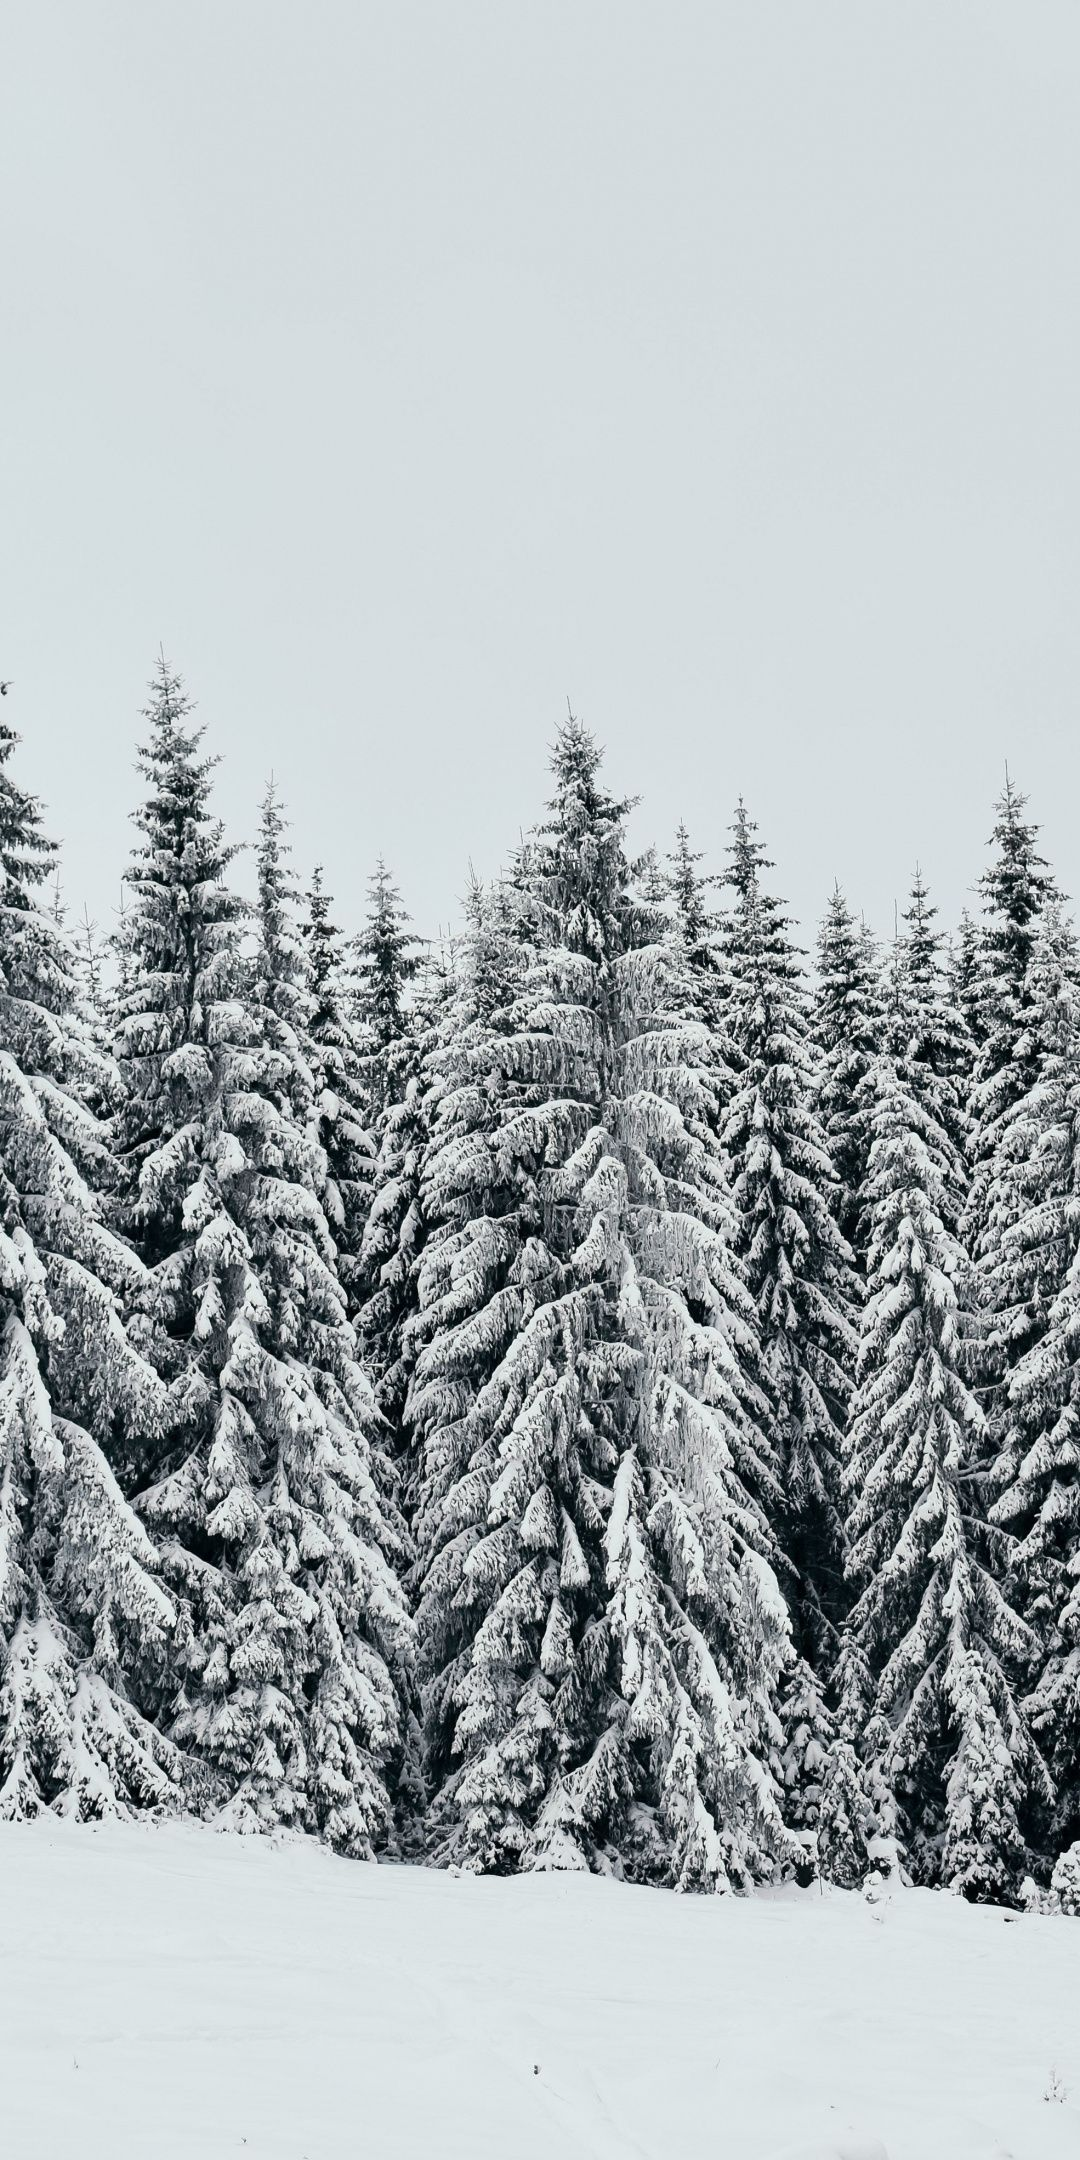 White Snow Layer Pine Trees Nature 1080x2160 Wallpaper Tree Wallpaper Iphone Iphone Wallpaper Winter Snow Tree